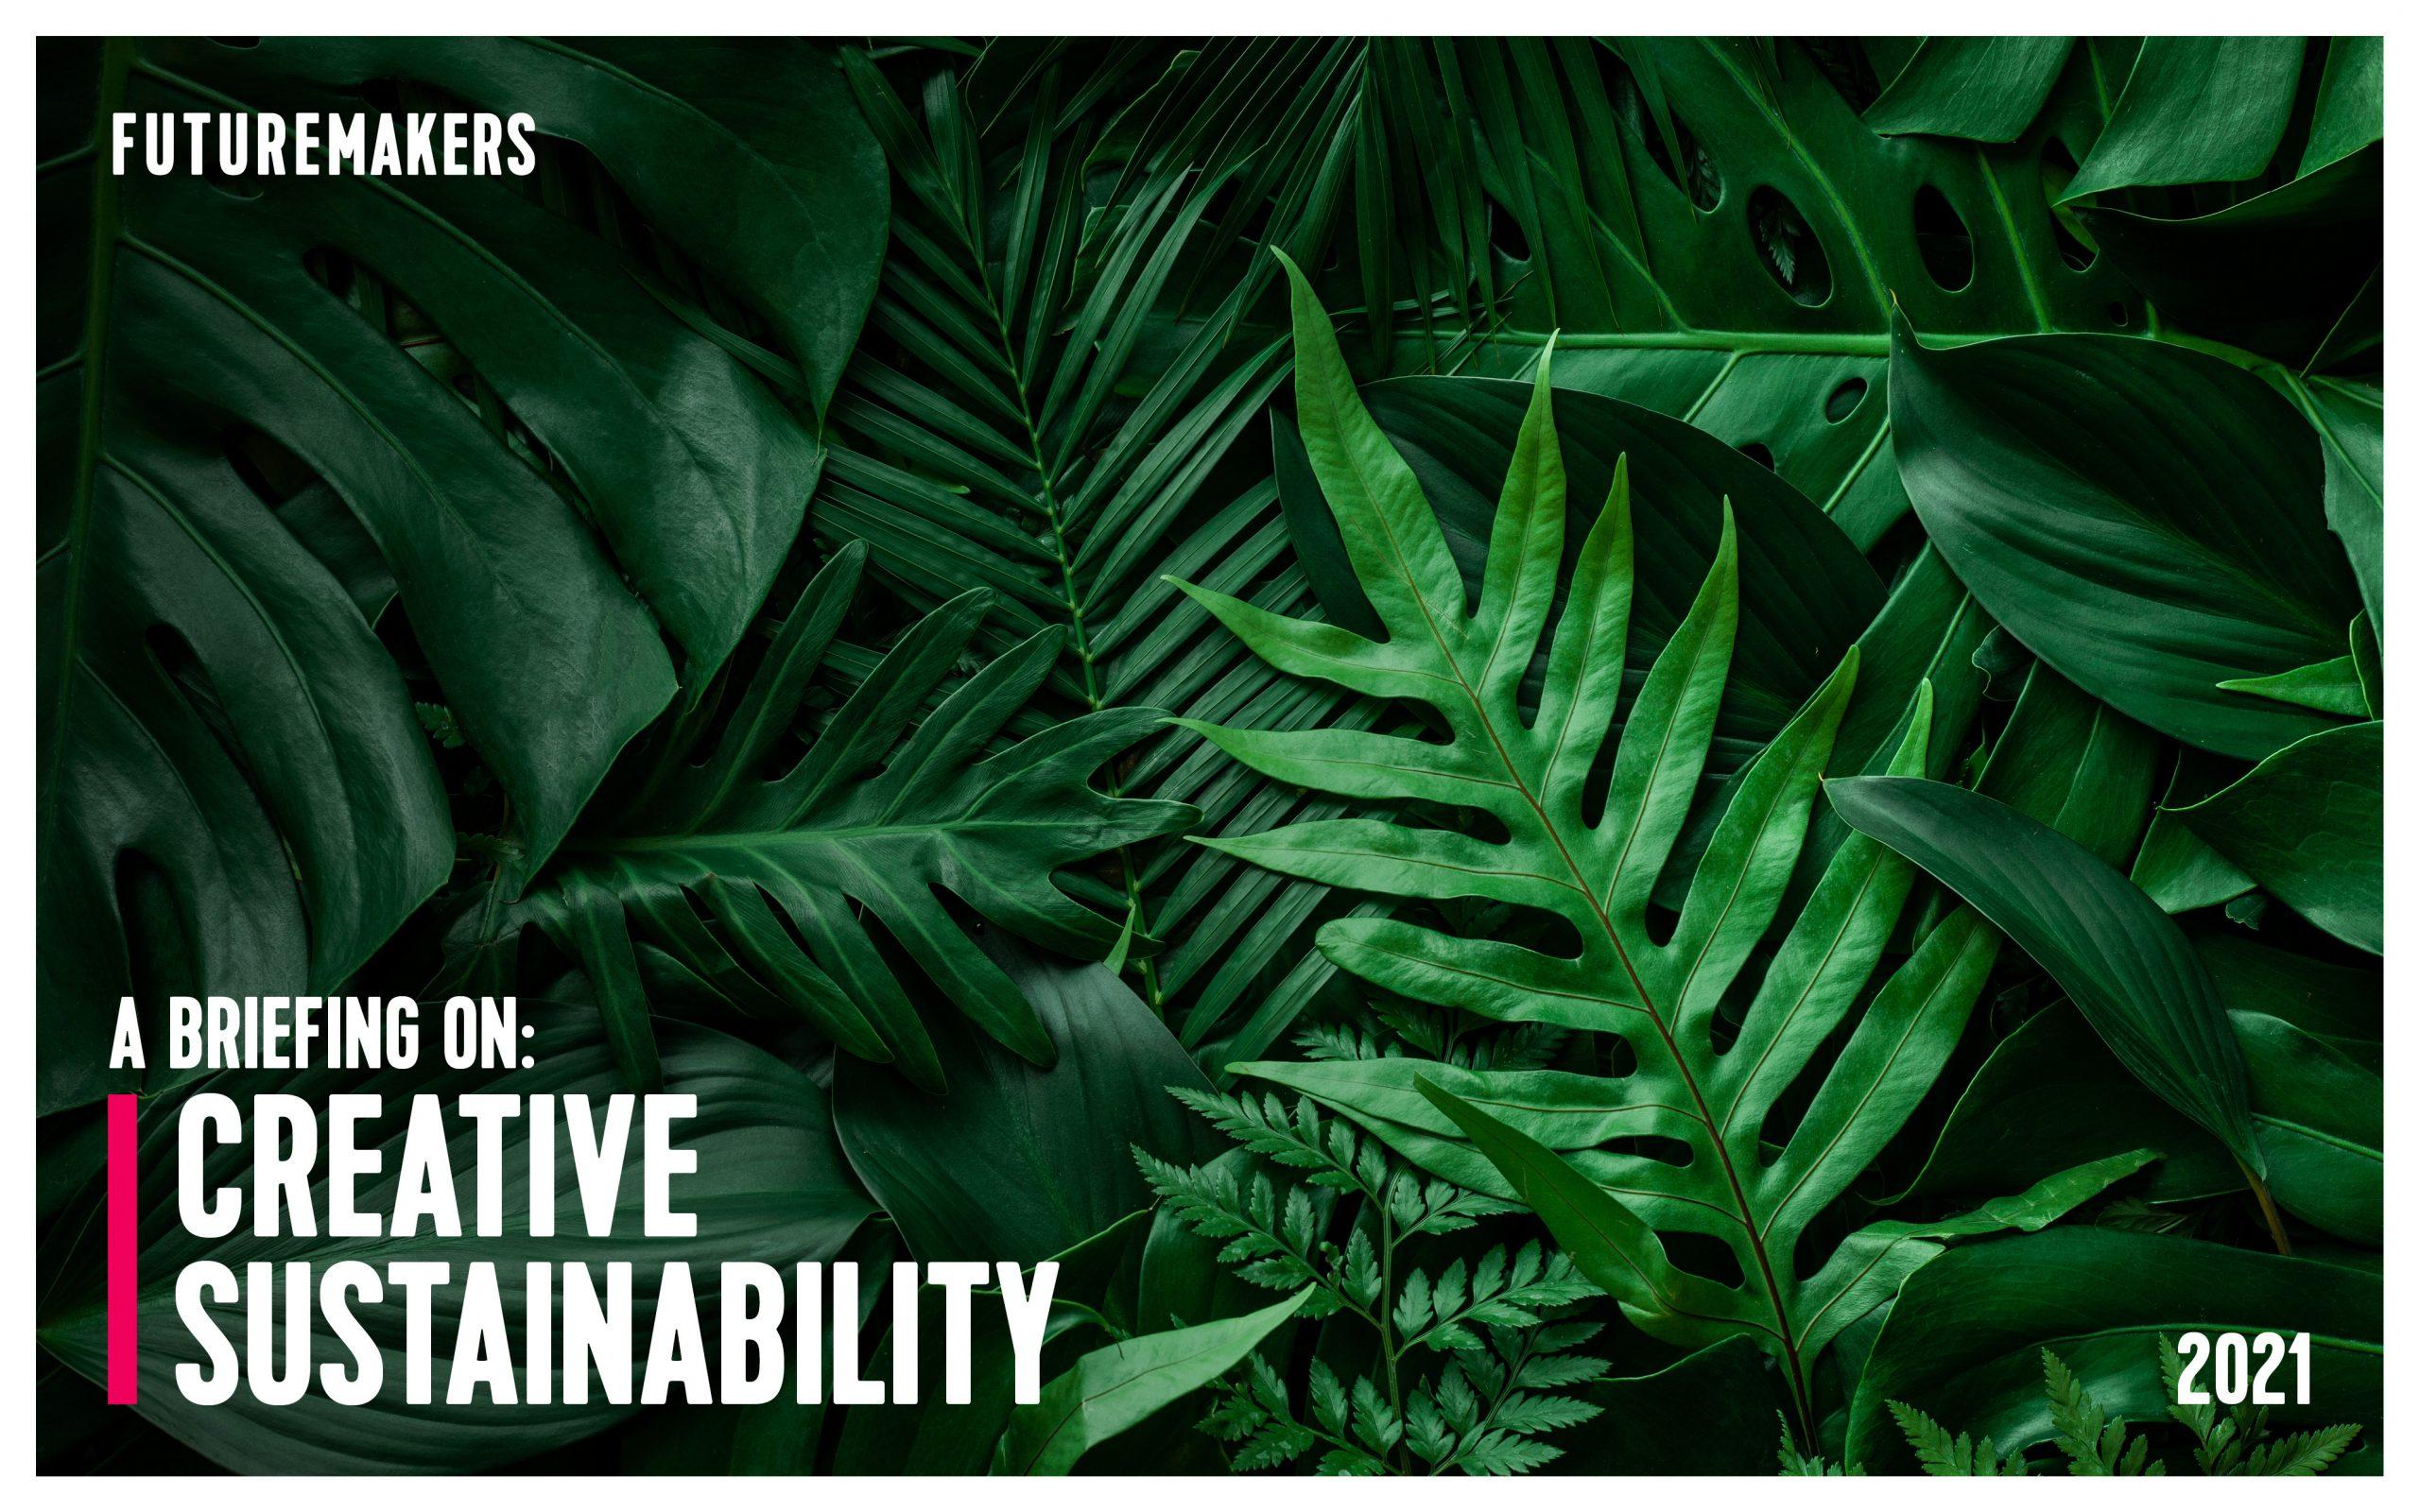 futuremakers-creative-sustainability-briefing-2021